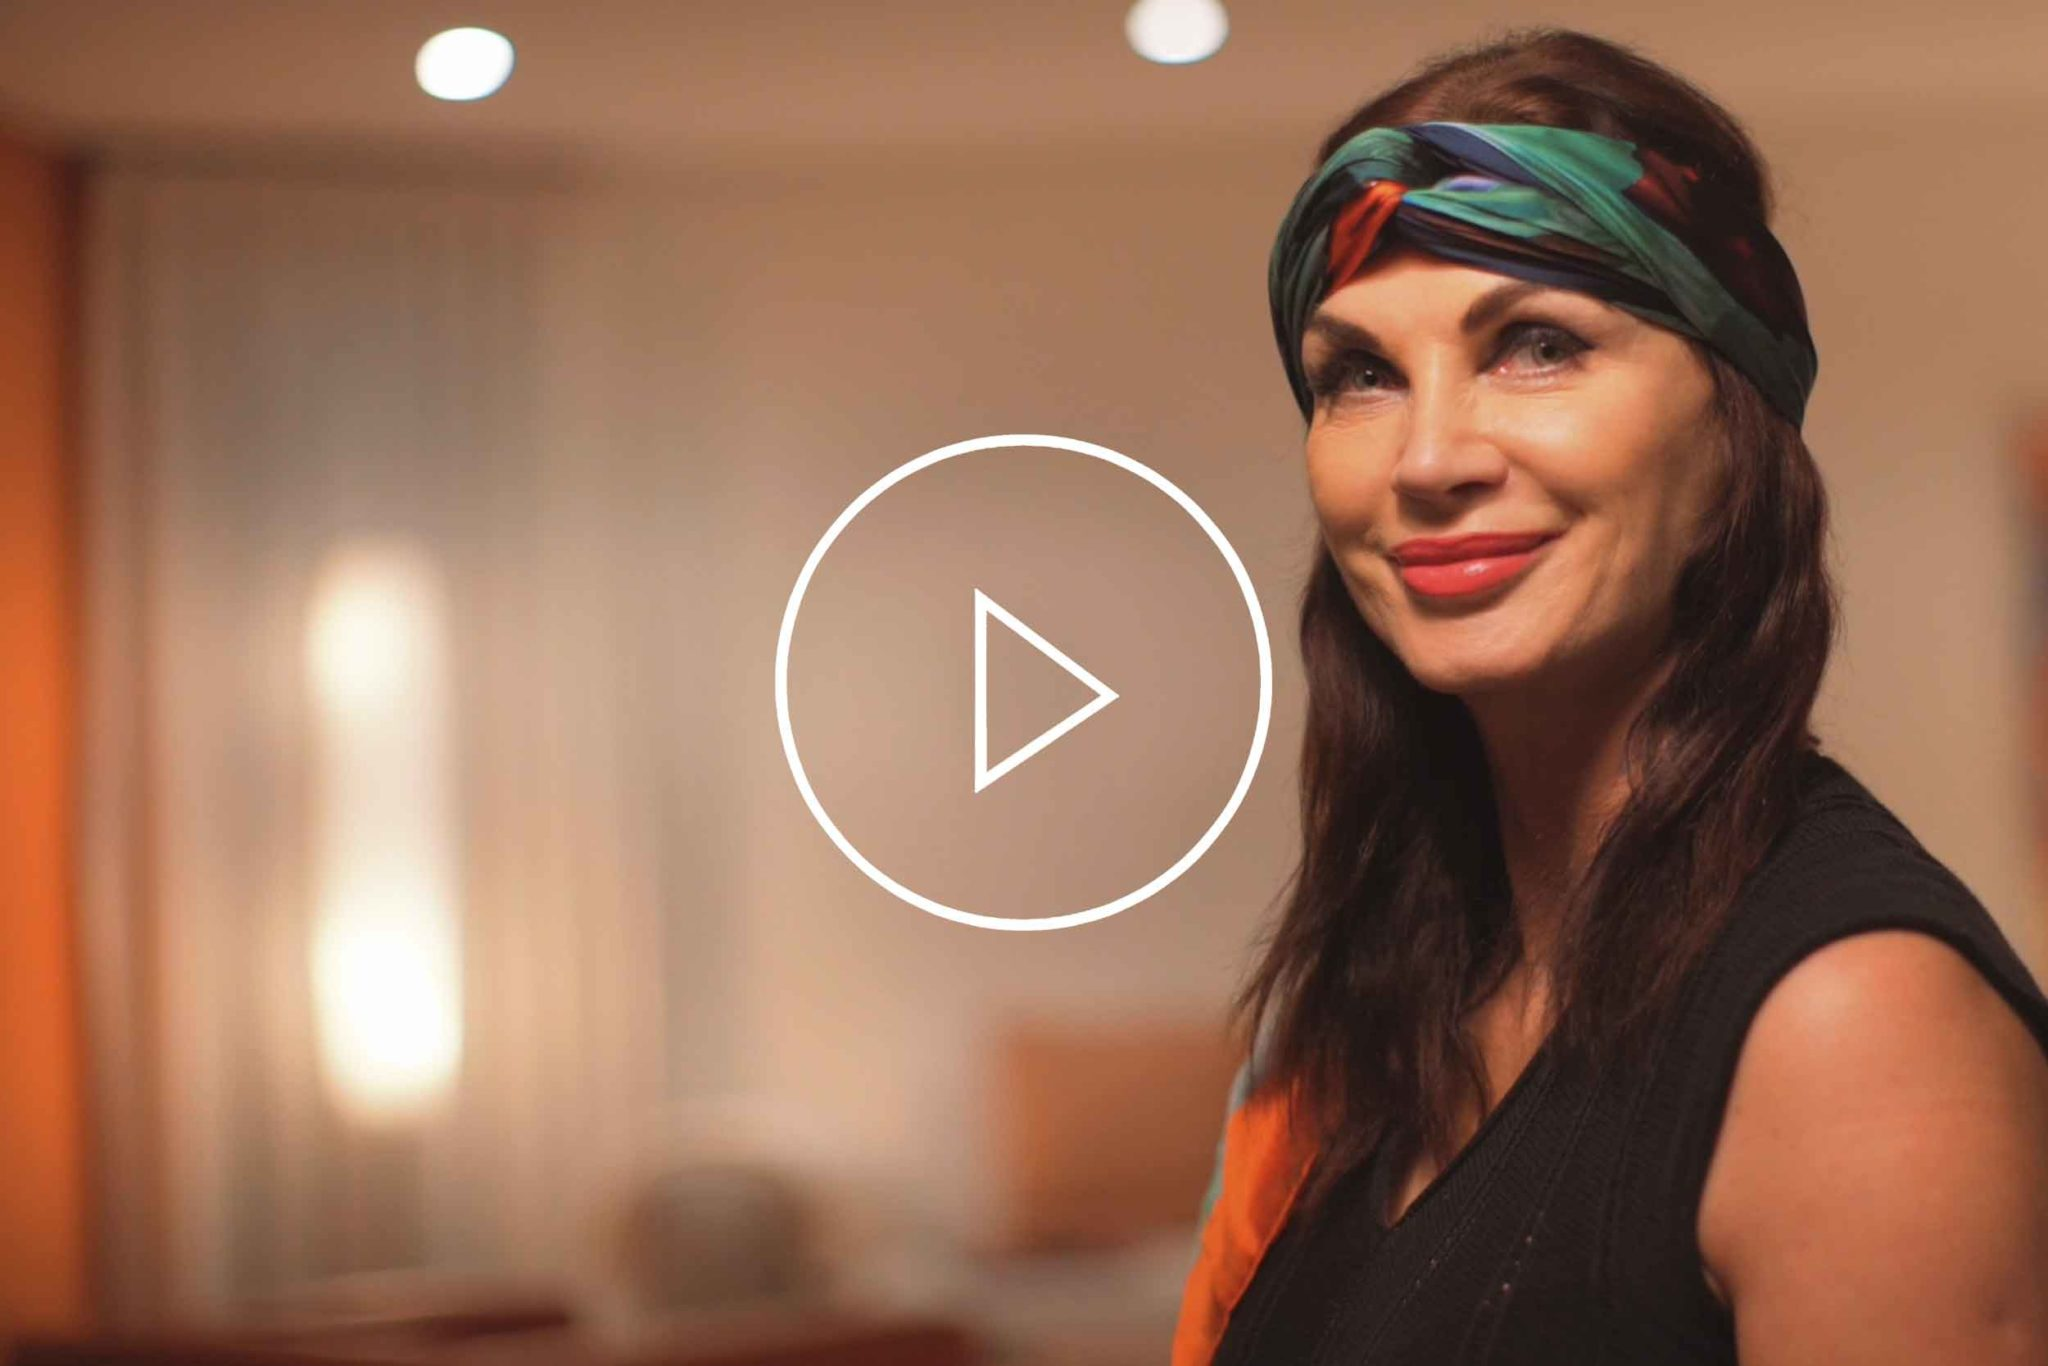 "La Galleria Contemporary Artist Cornelia Hagmann Silk Scarves Movie Vintage Style Head Scarf ""Marlene"", Seidenschal, sciarpa di seta, foulard soie,"